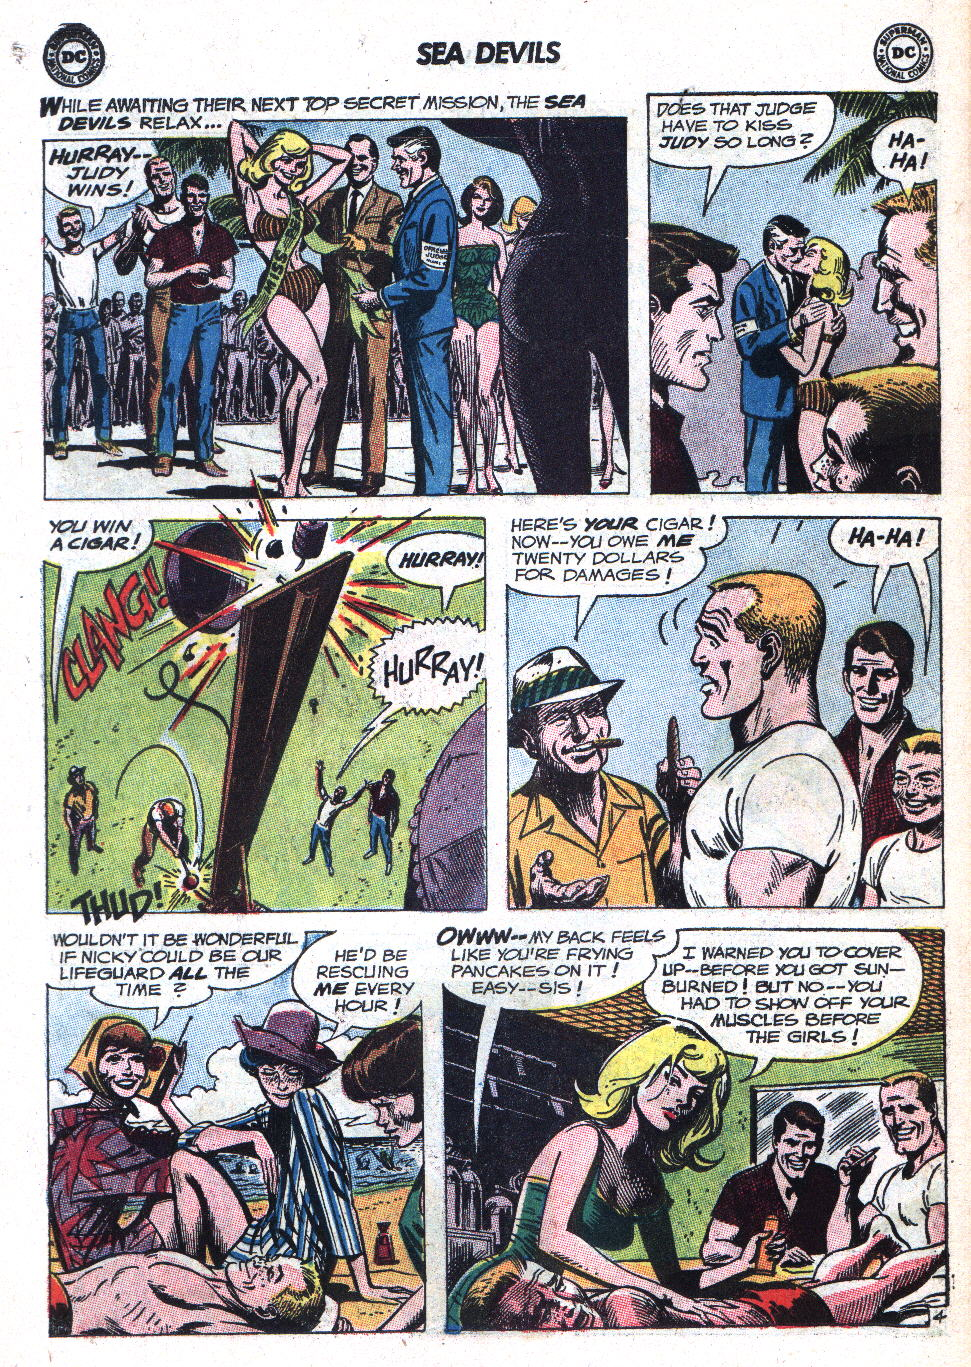 Read online Sea Devils comic -  Issue #9 - 7